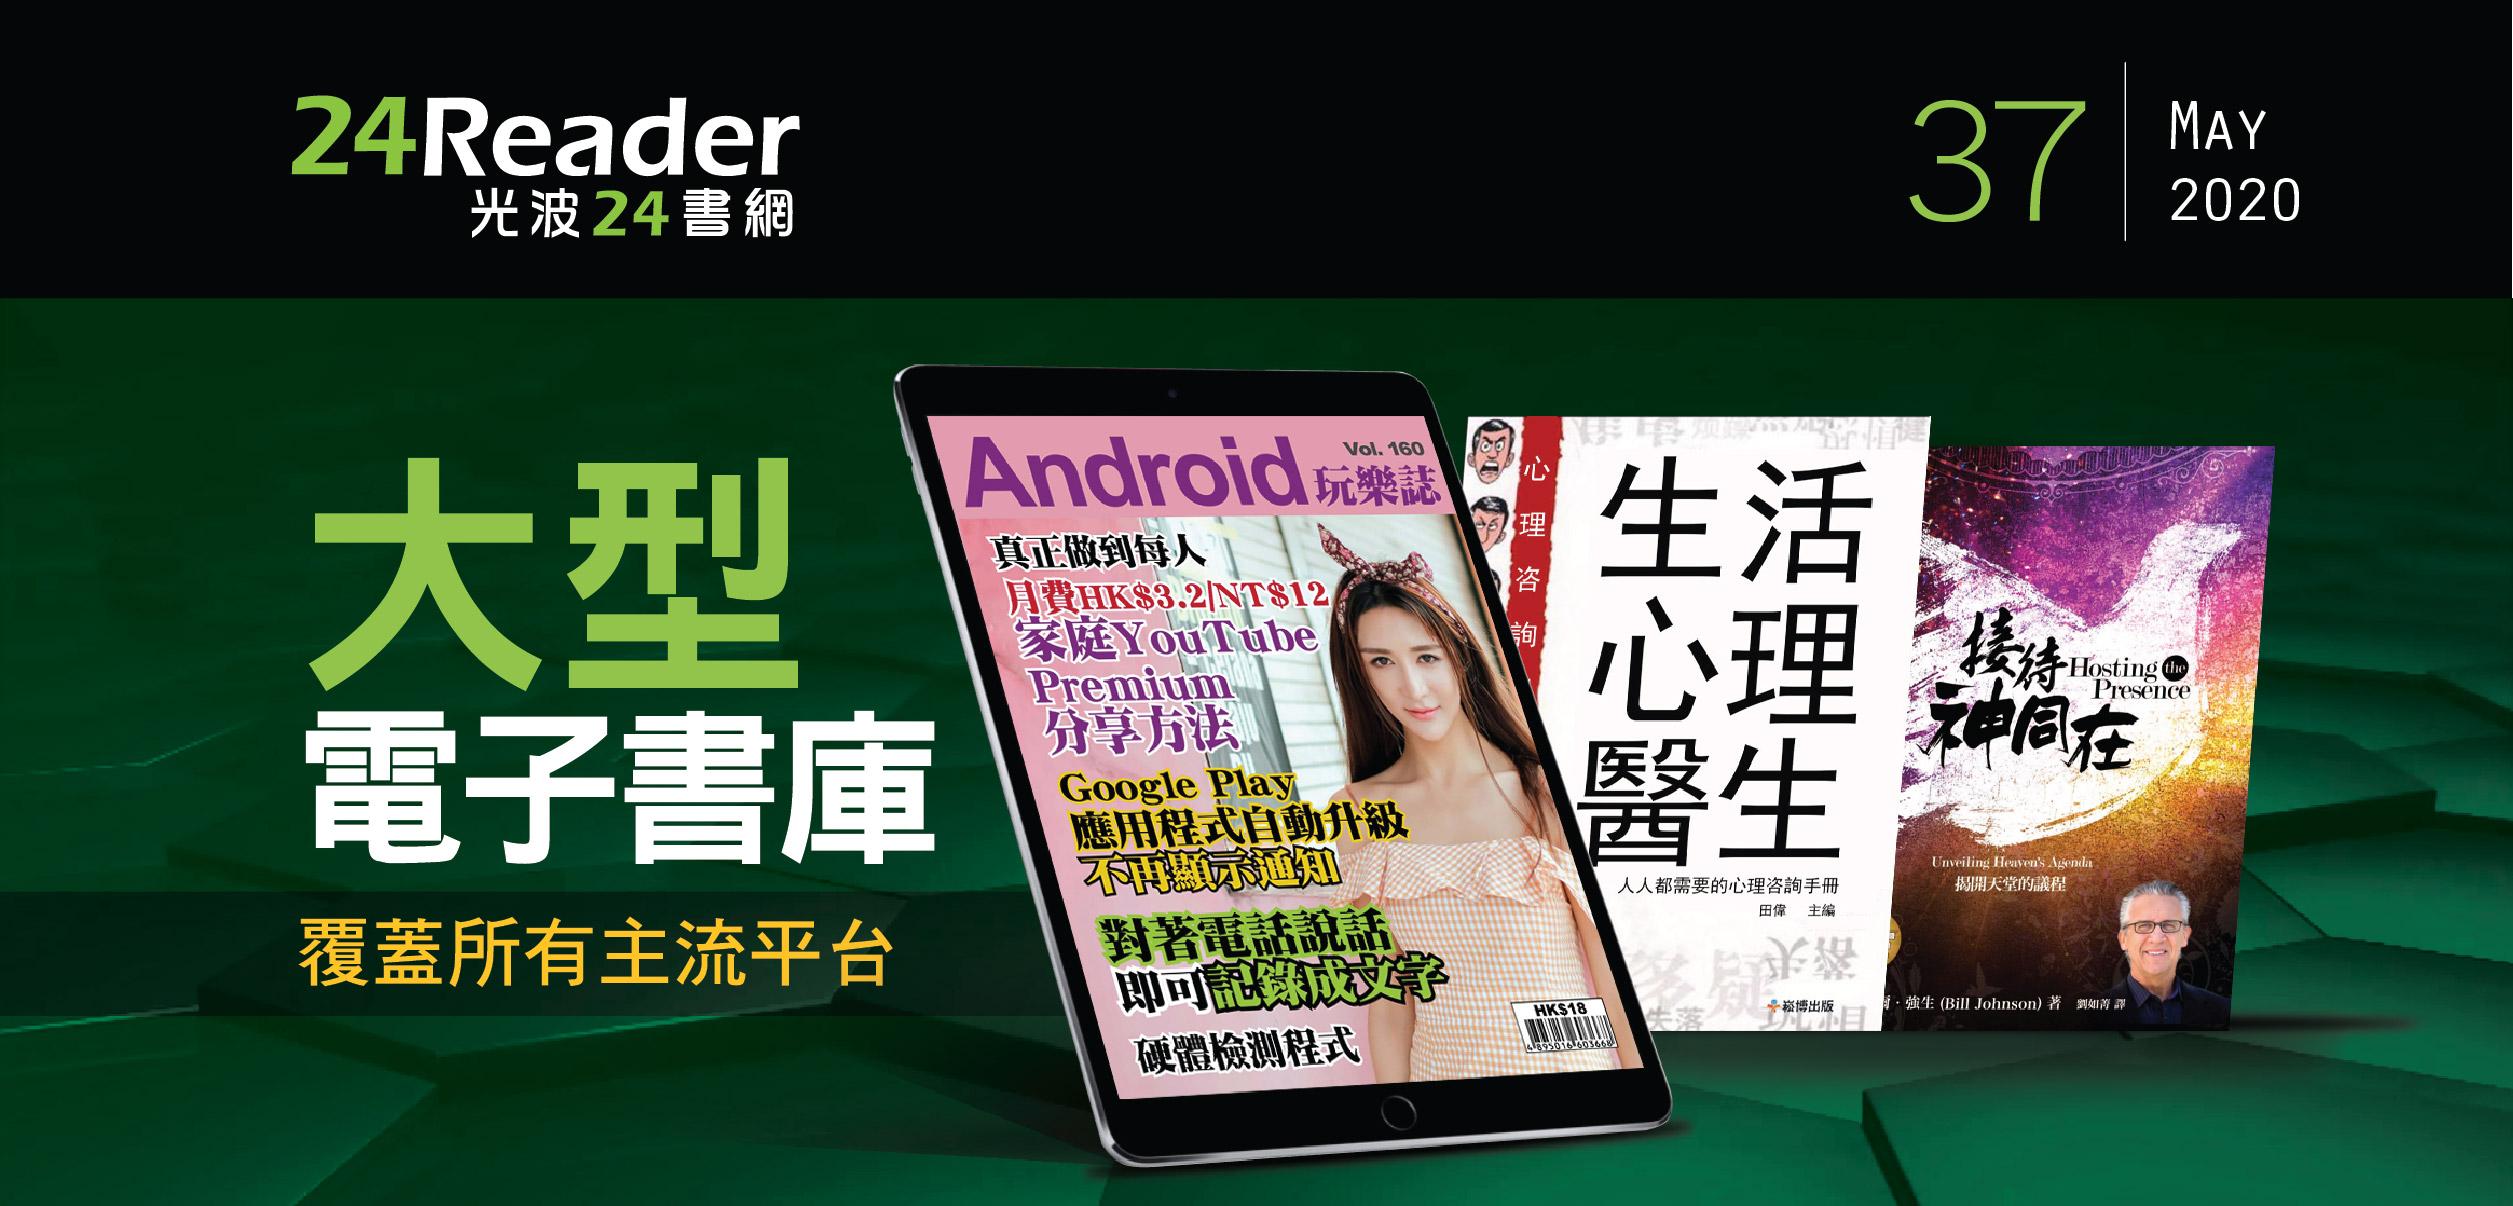 《Android 玩樂誌》每人只需要!HK$3.25家庭 YouTube Premium 分享方法